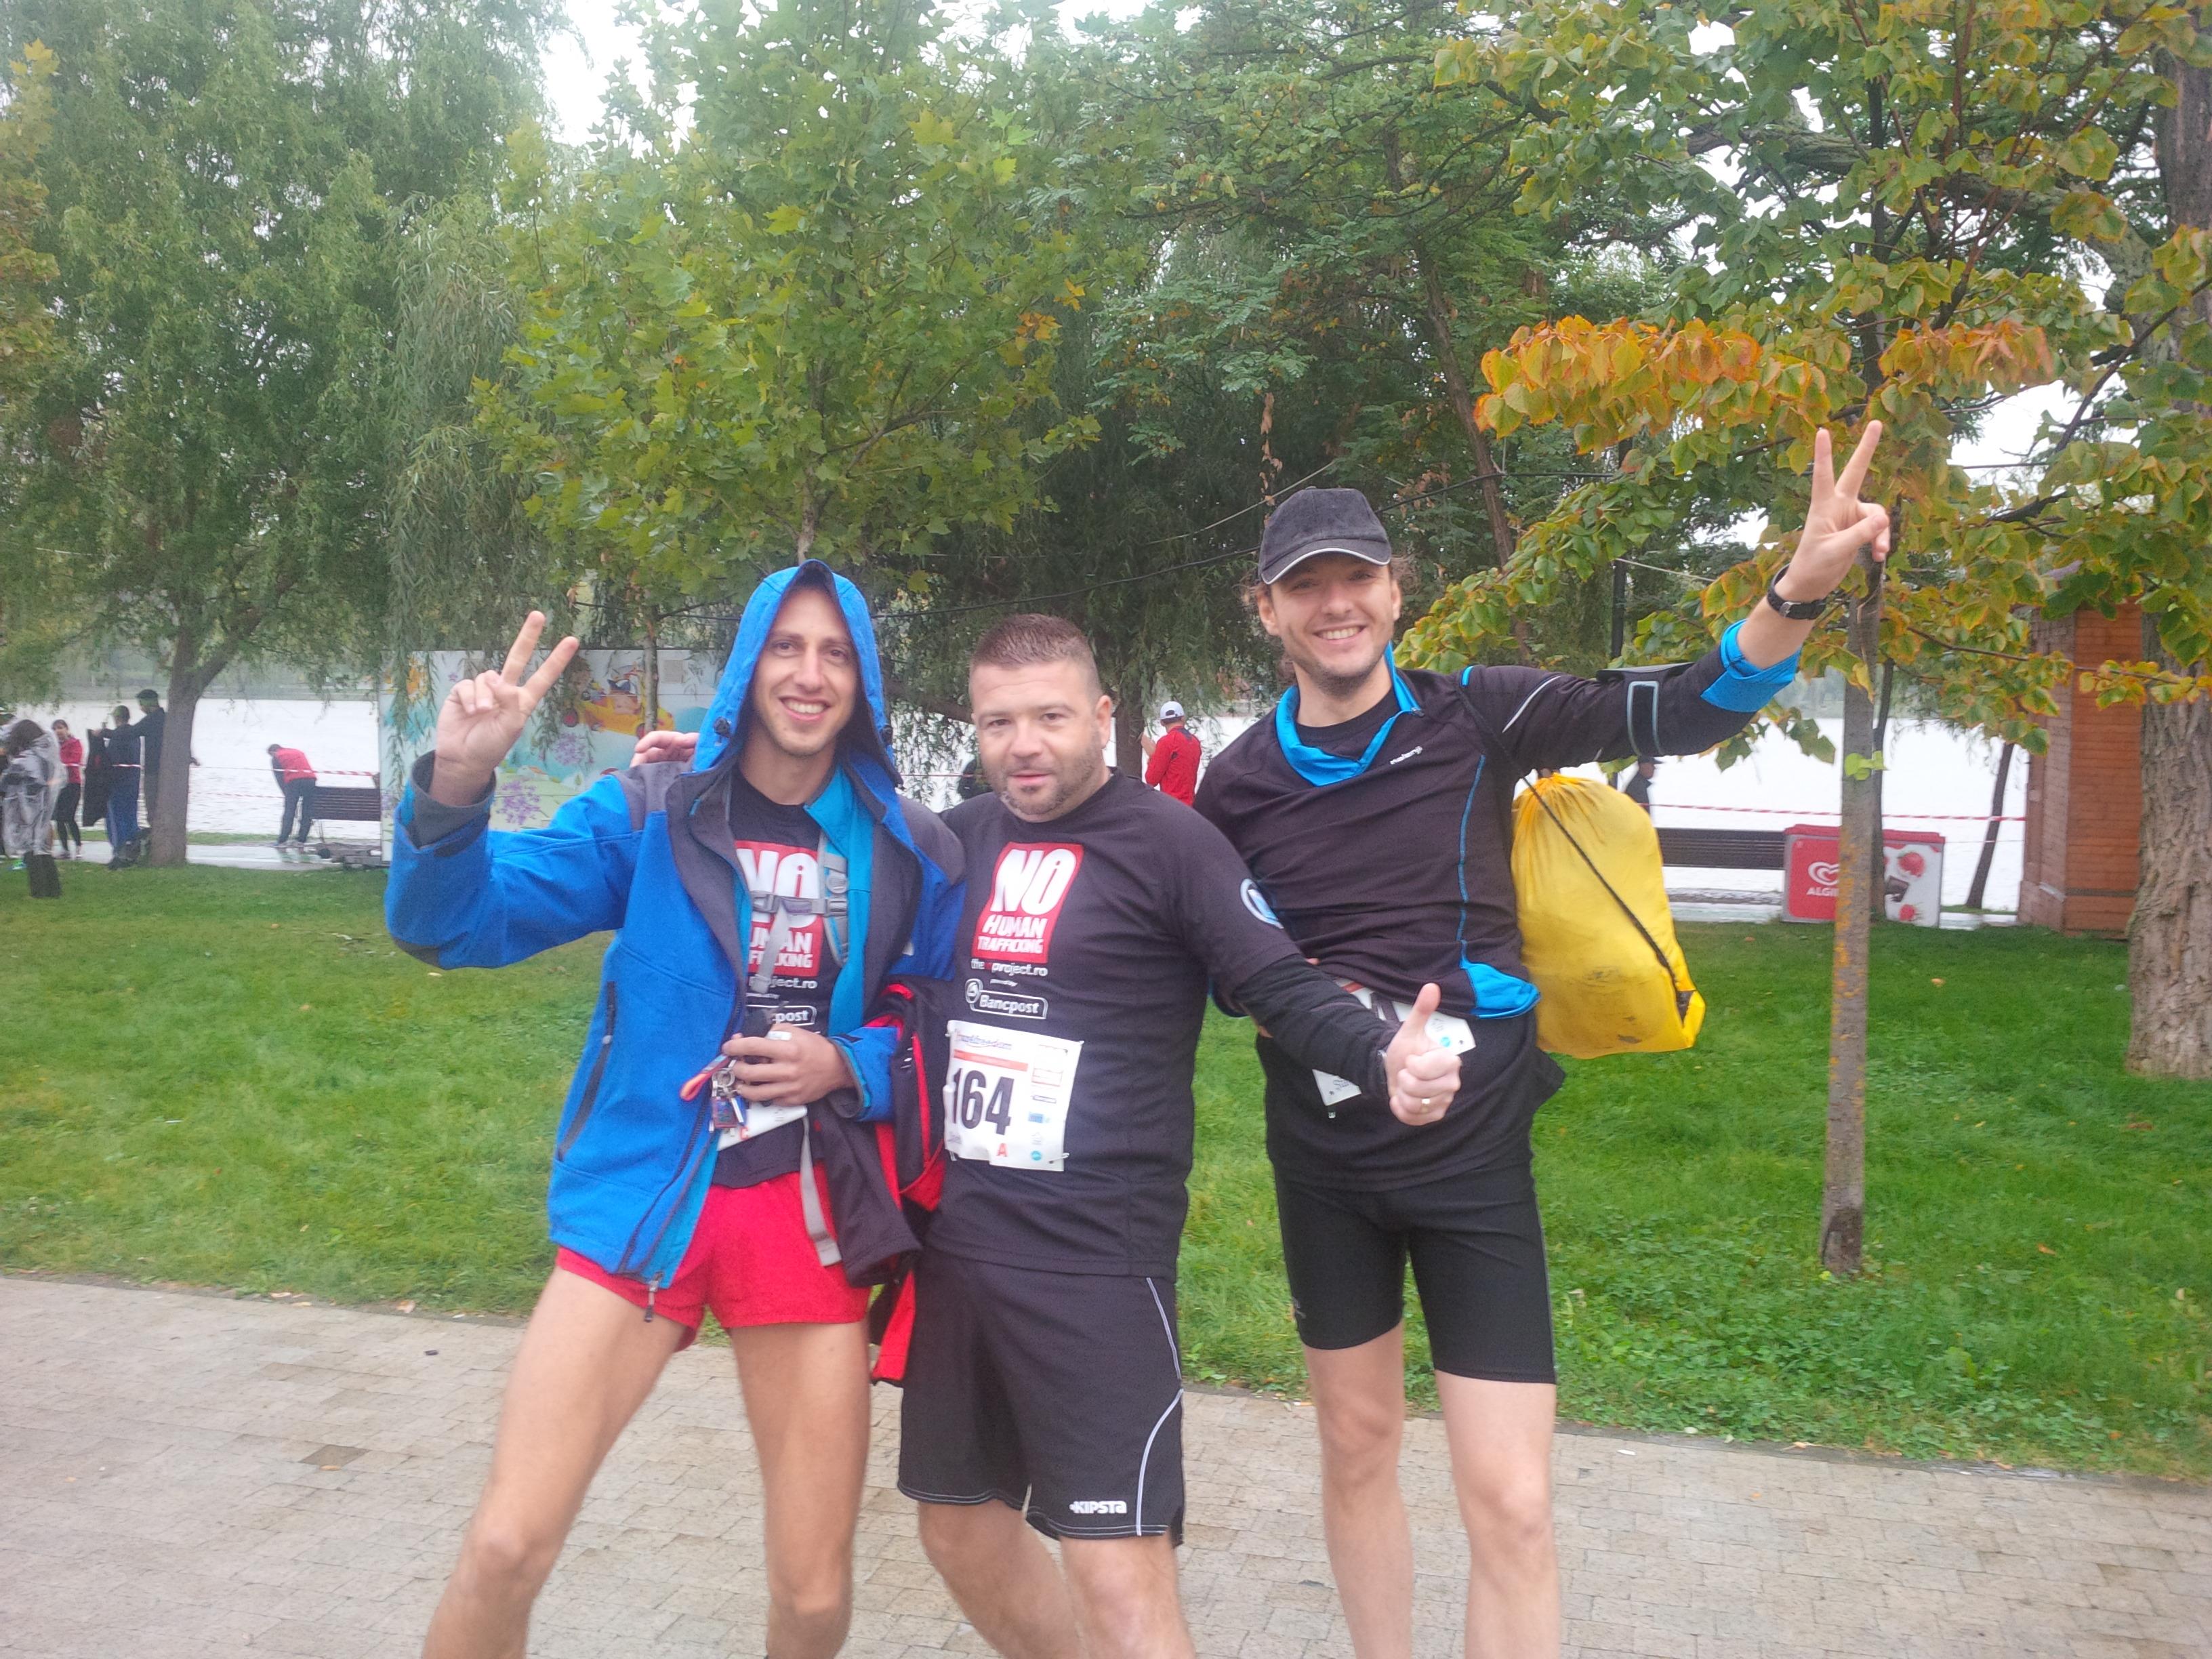 Run4Freedom - echipa Biciclistul.ro